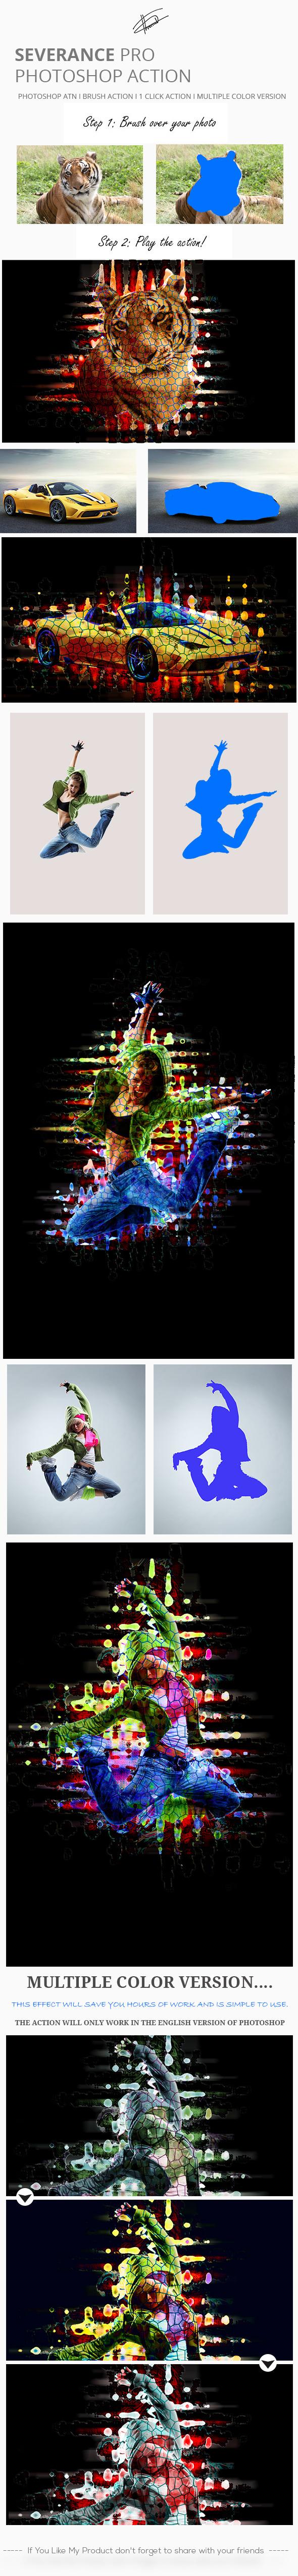 GraphicRiver Severance Pro Photoshop Action 11893471